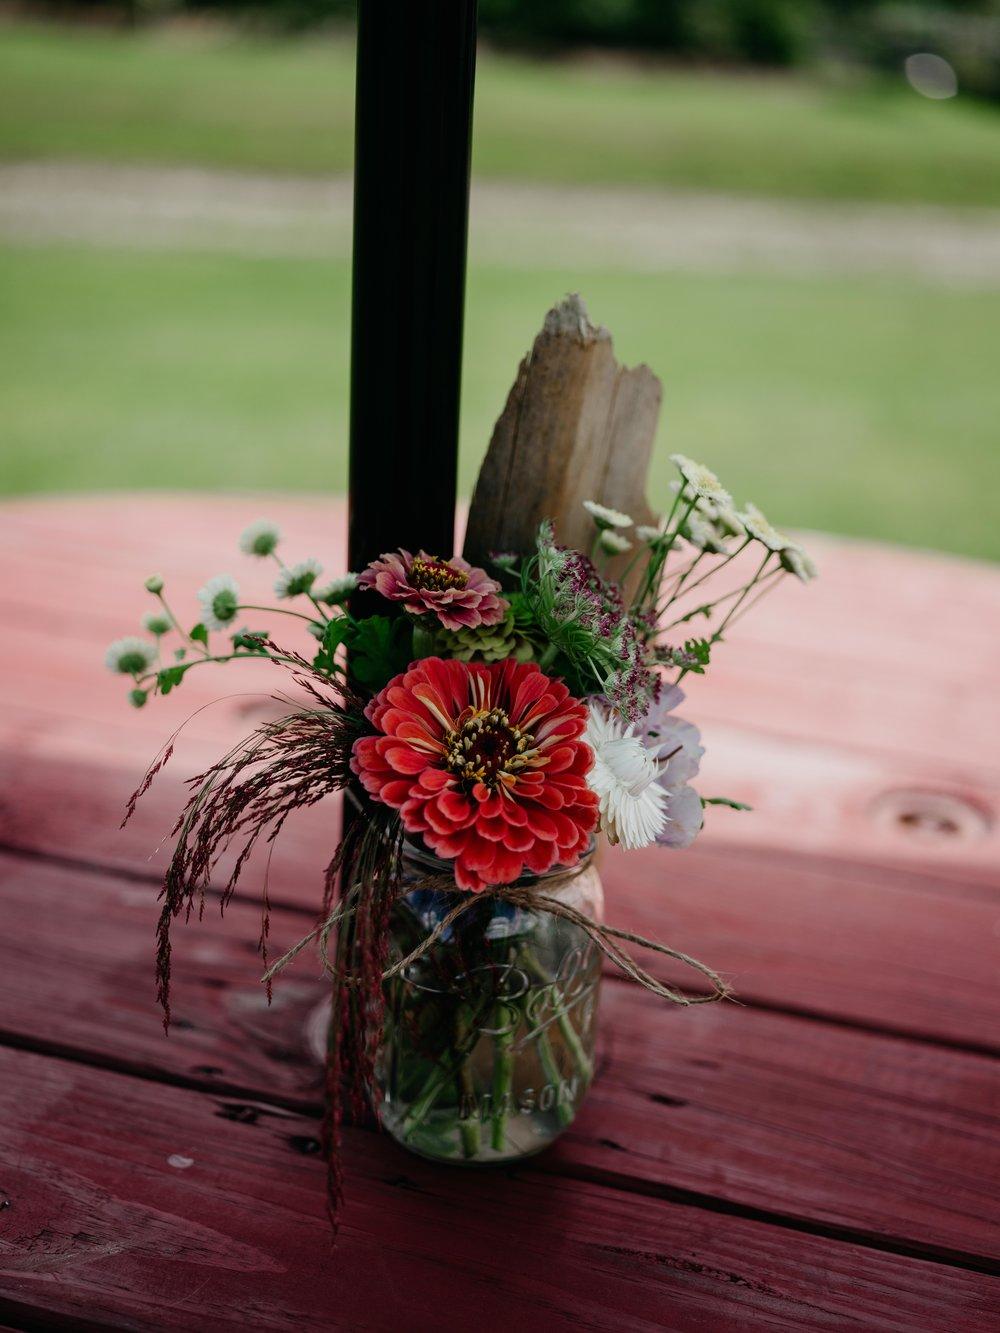 Wiilde-Scout-Photo-Co-Lauren-Steve-Bliss-Ridge-Wedding-Moretown-Vermont-171.jpg